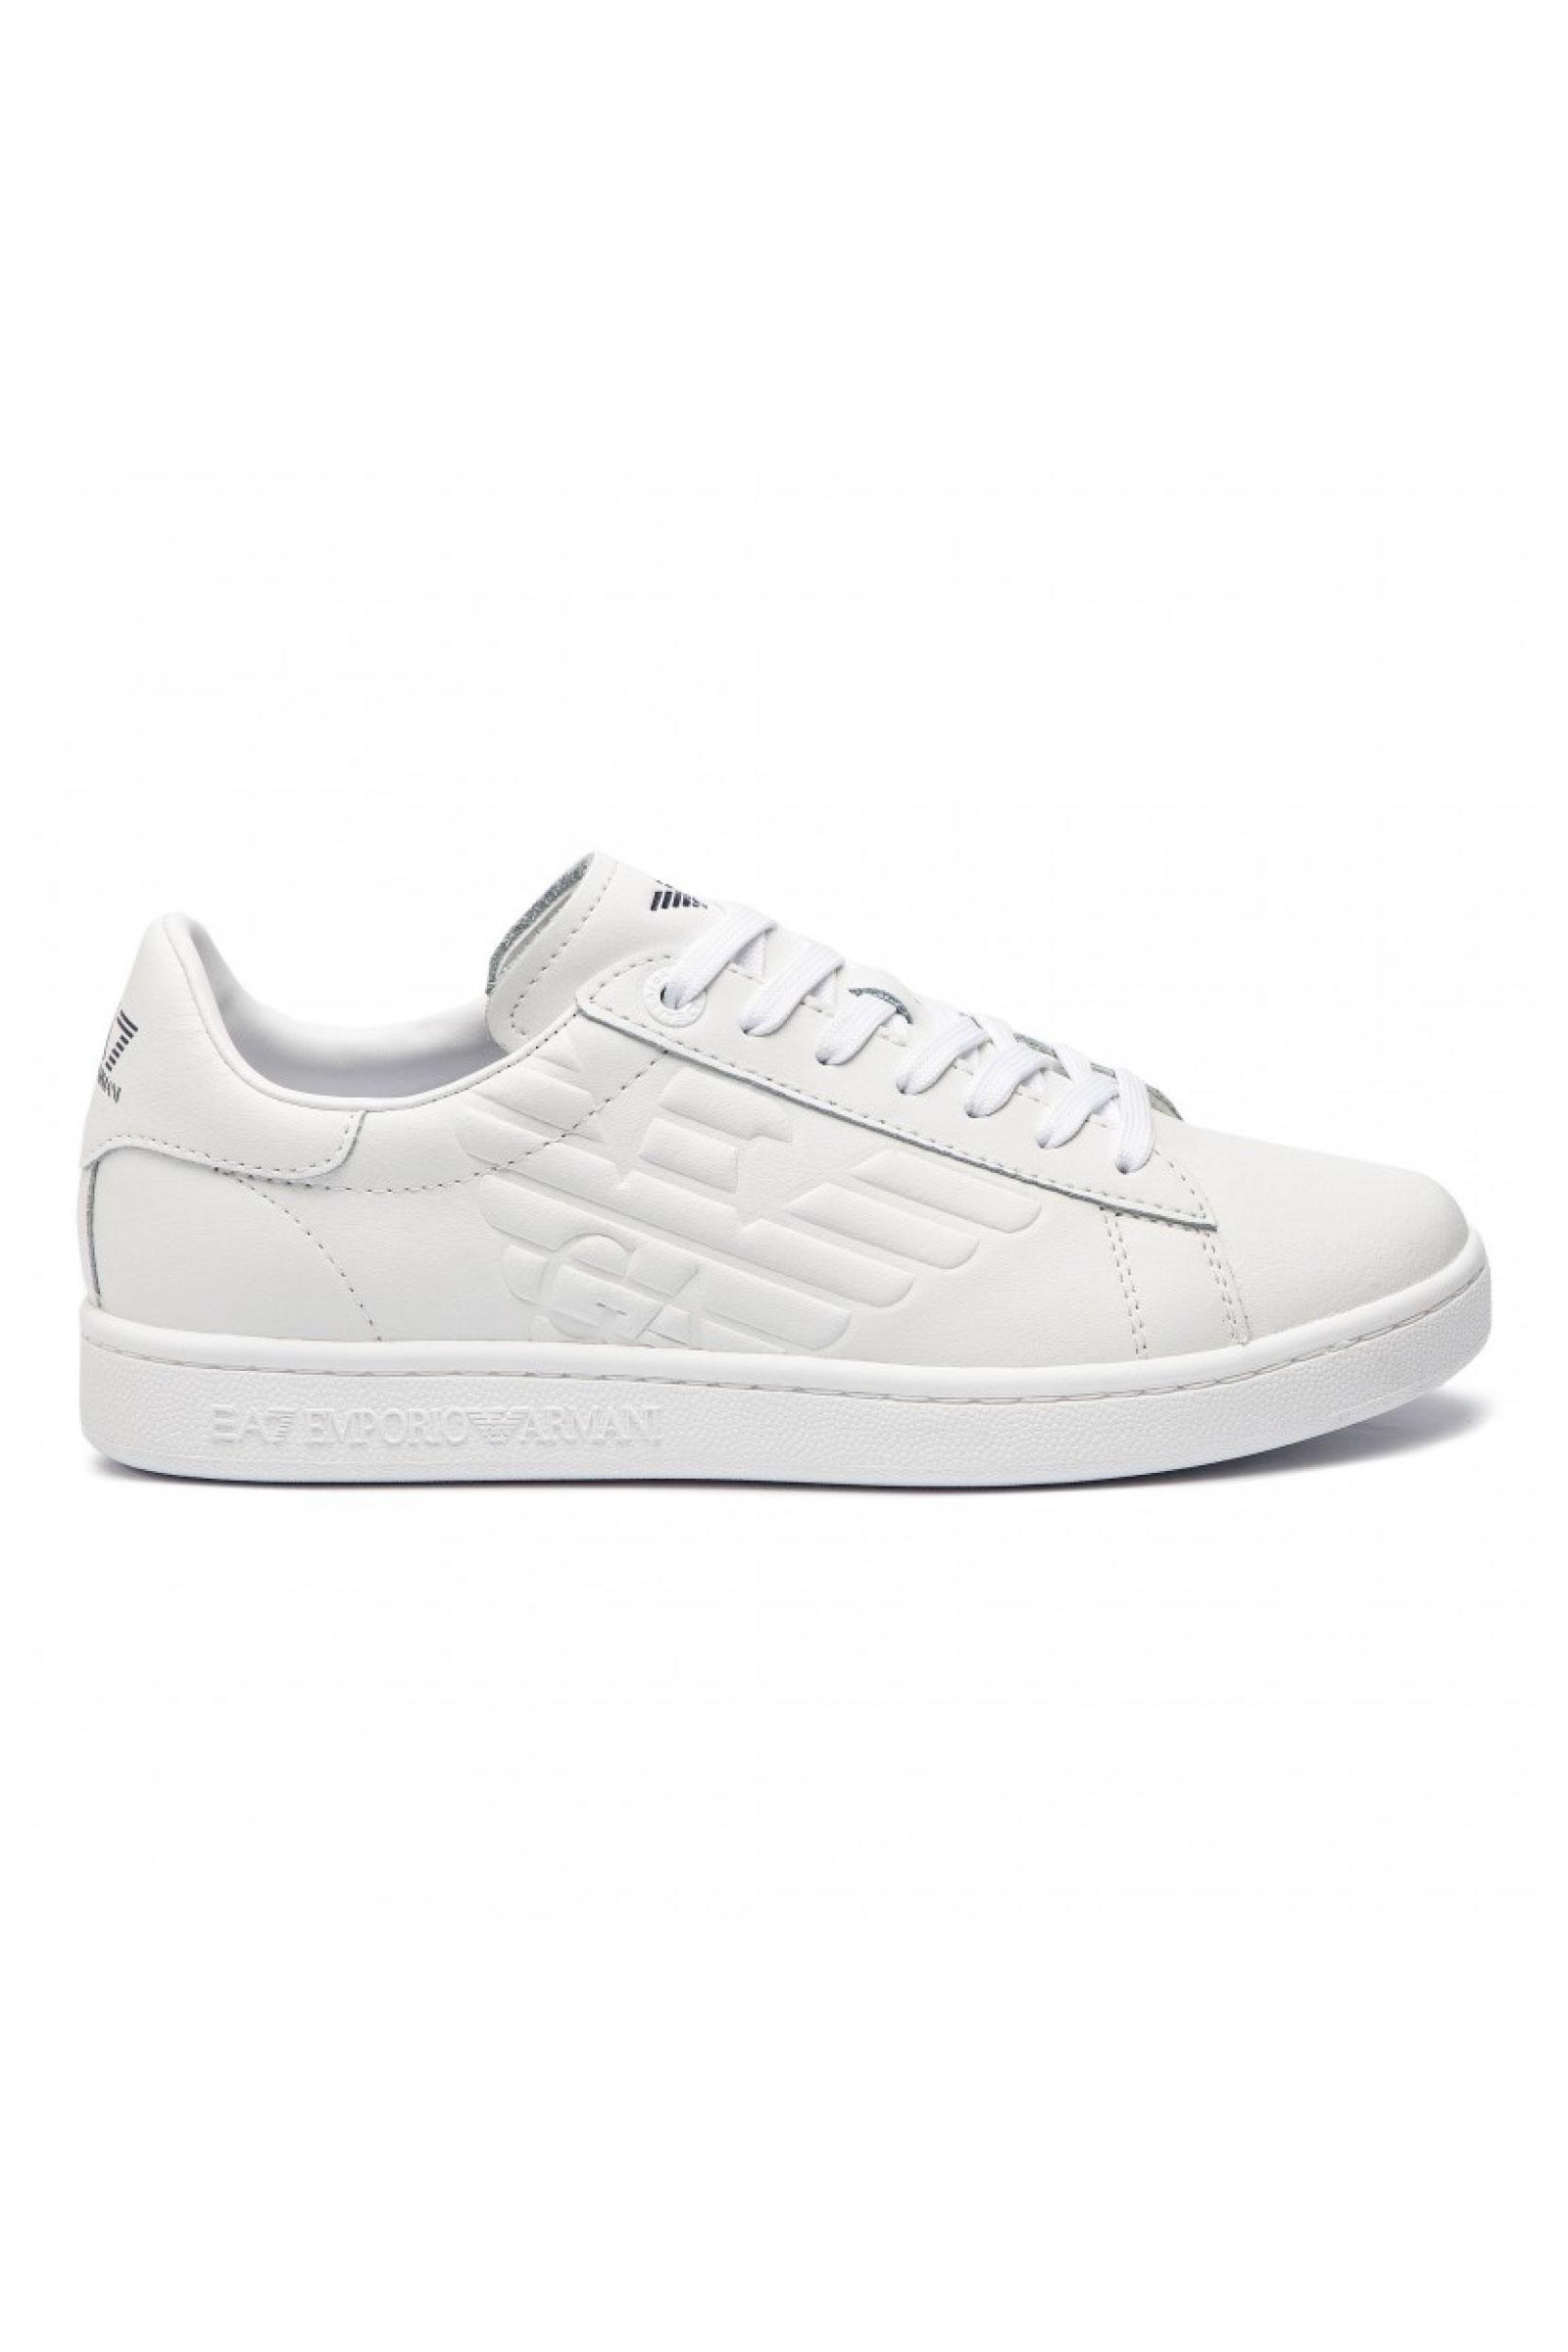 ARMANI EA7 | Shoes | X8X001 XCC5100001